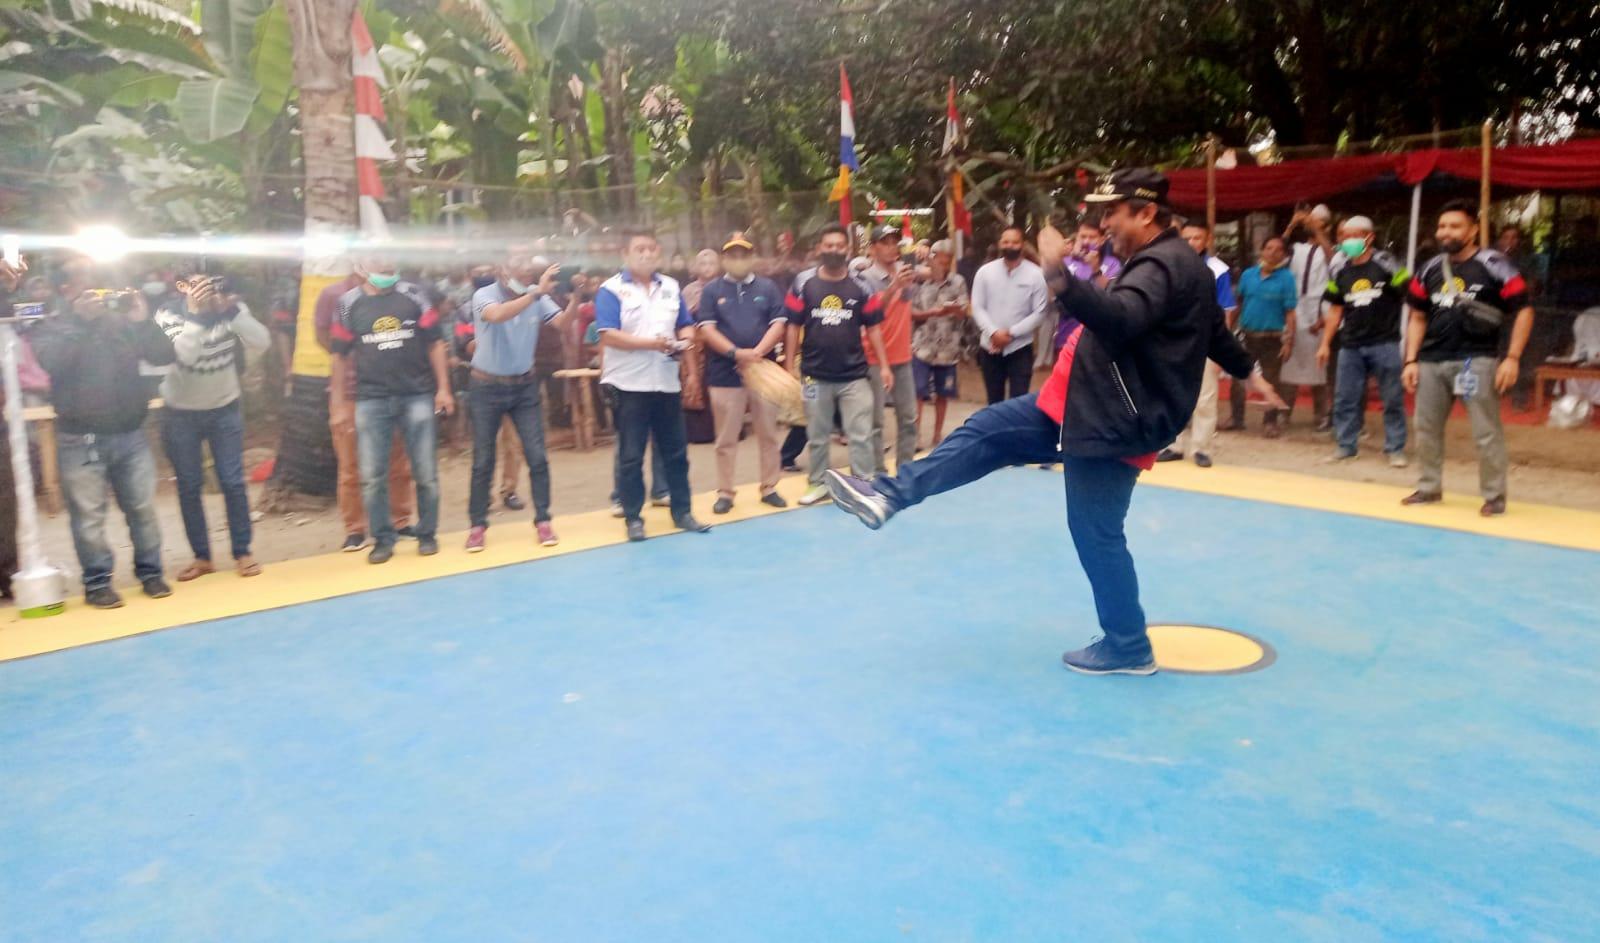 Bupati Maros Chaidir Syam Buka Turnamen Sepak Takraw Mannaungi Open